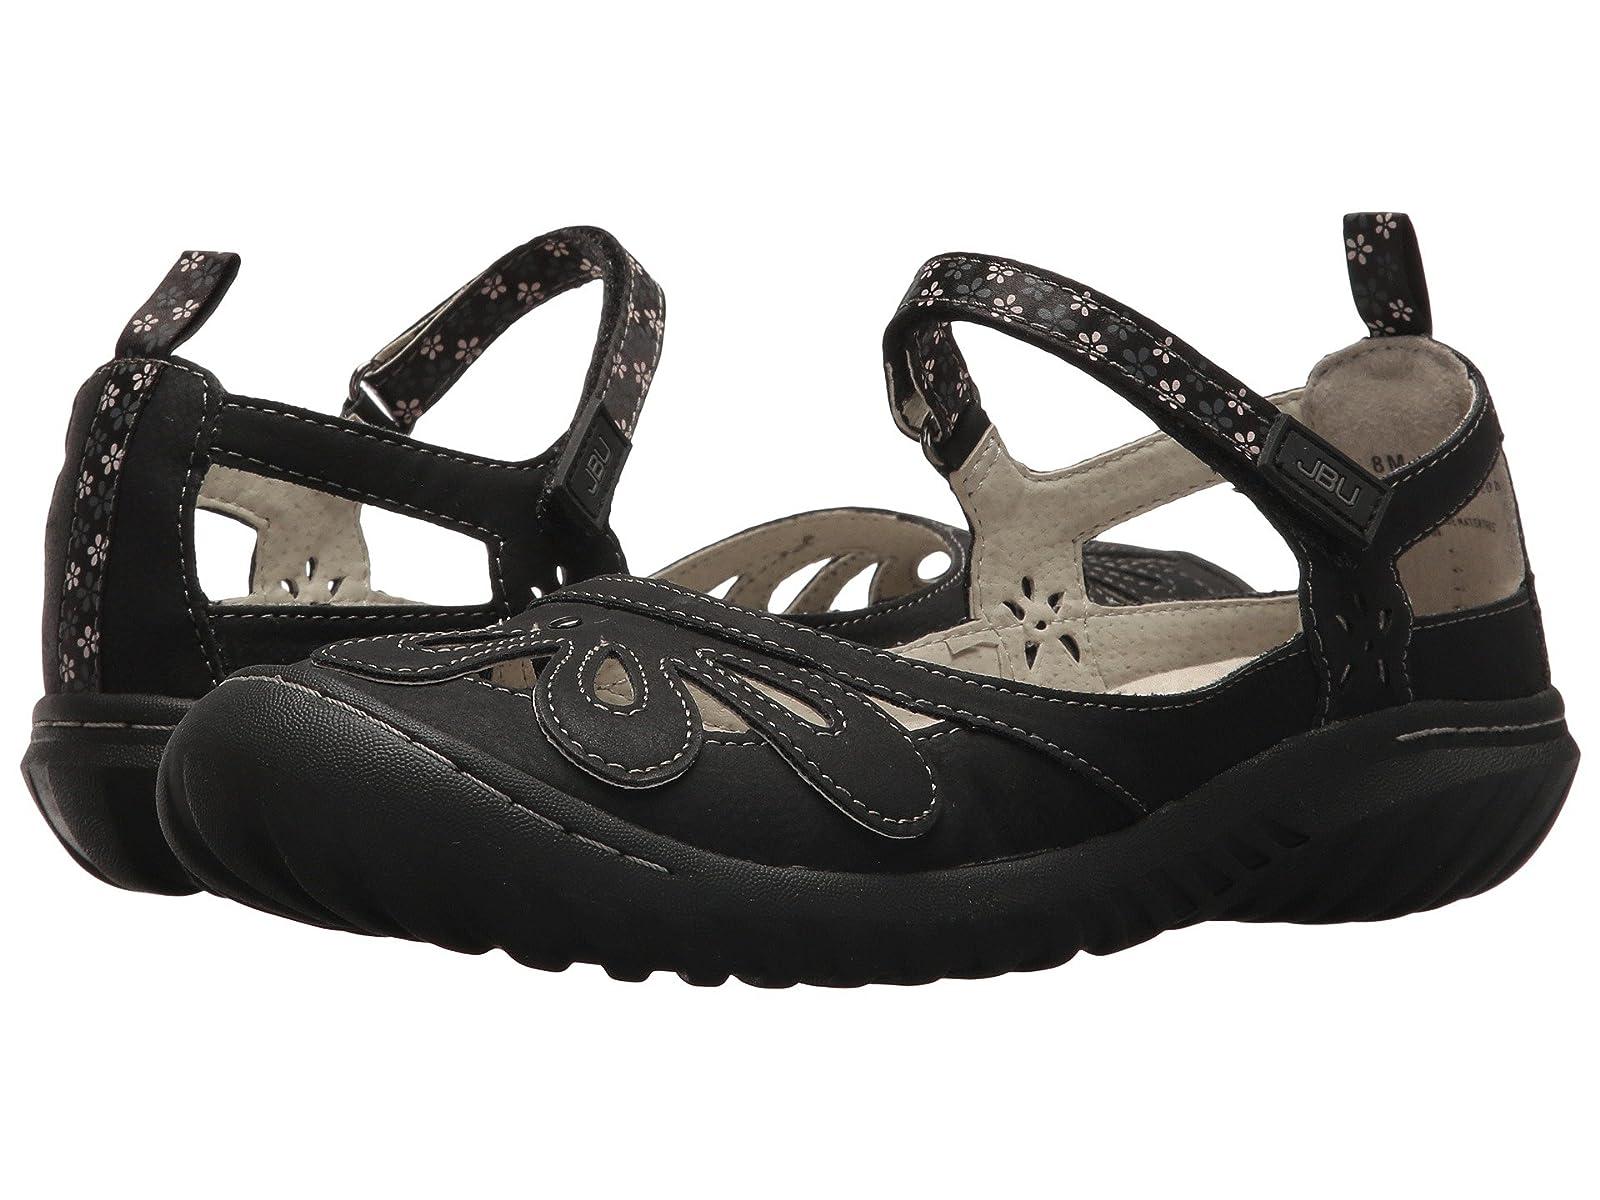 JBU Wildflower EncoreAtmospheric grades have affordable shoes